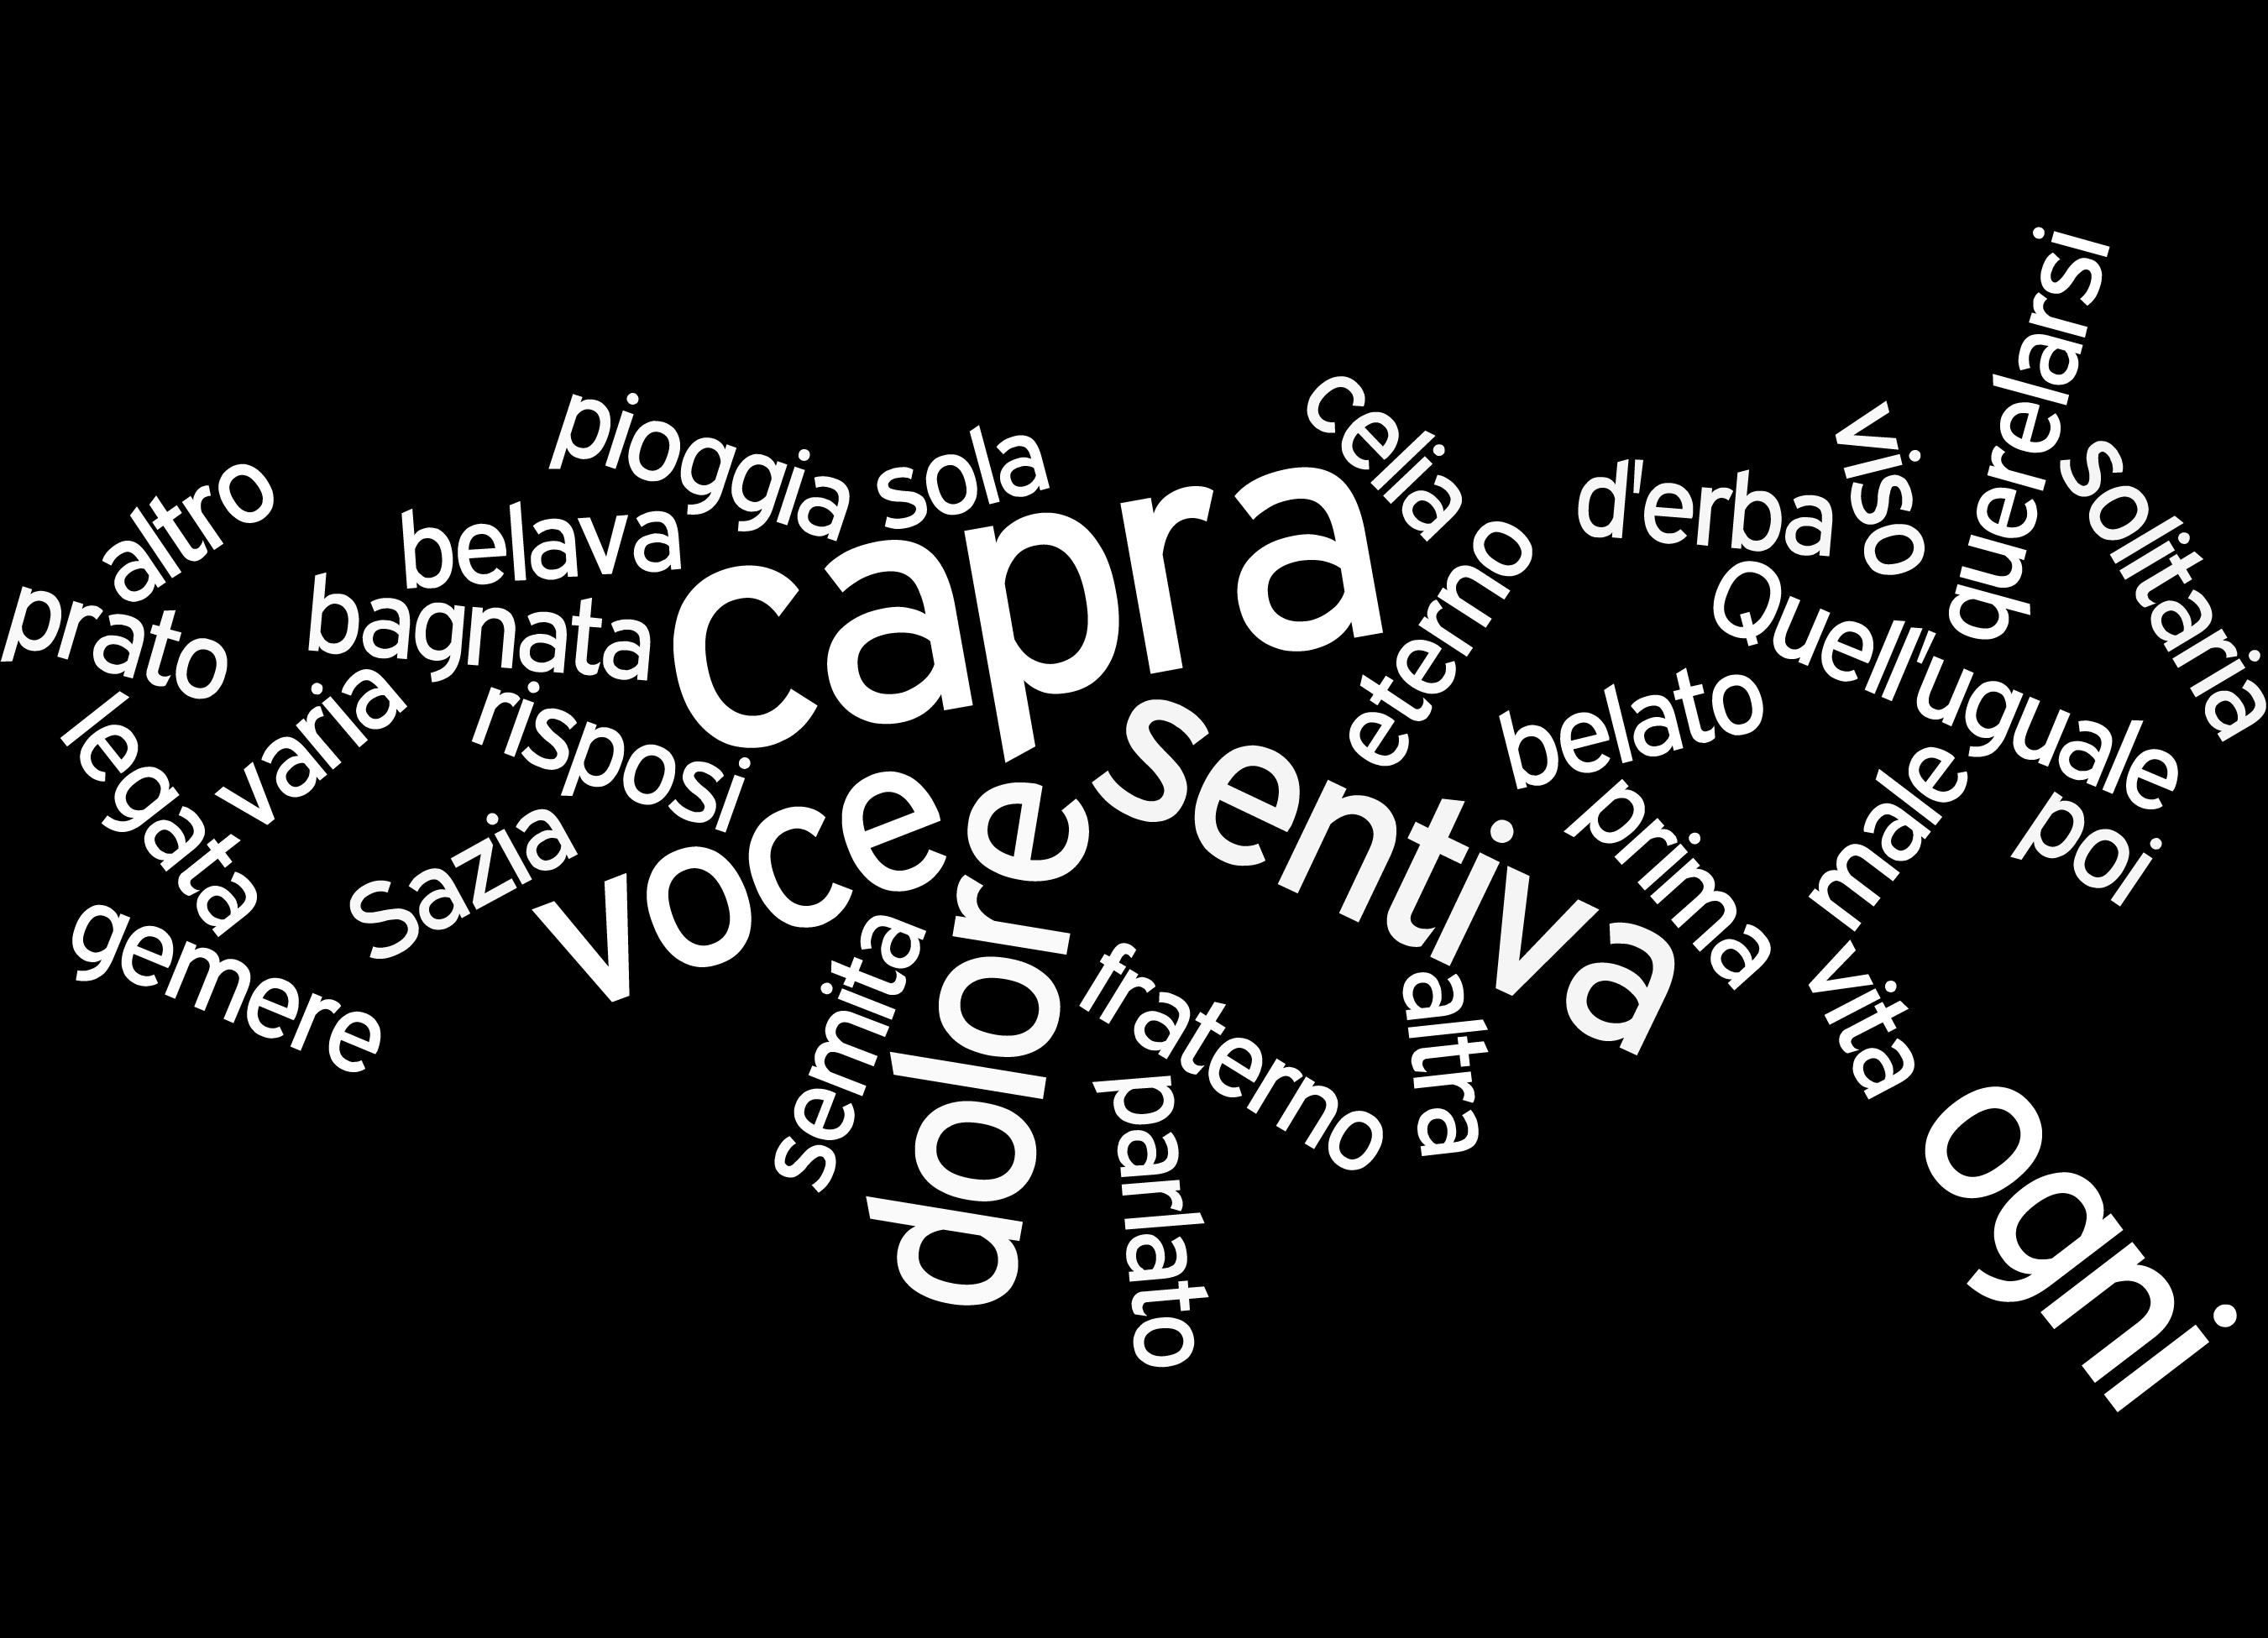 La Credenza Arthur Rimbaud Parafrasi : Umberto saba u2013 nuvole di poesia ~